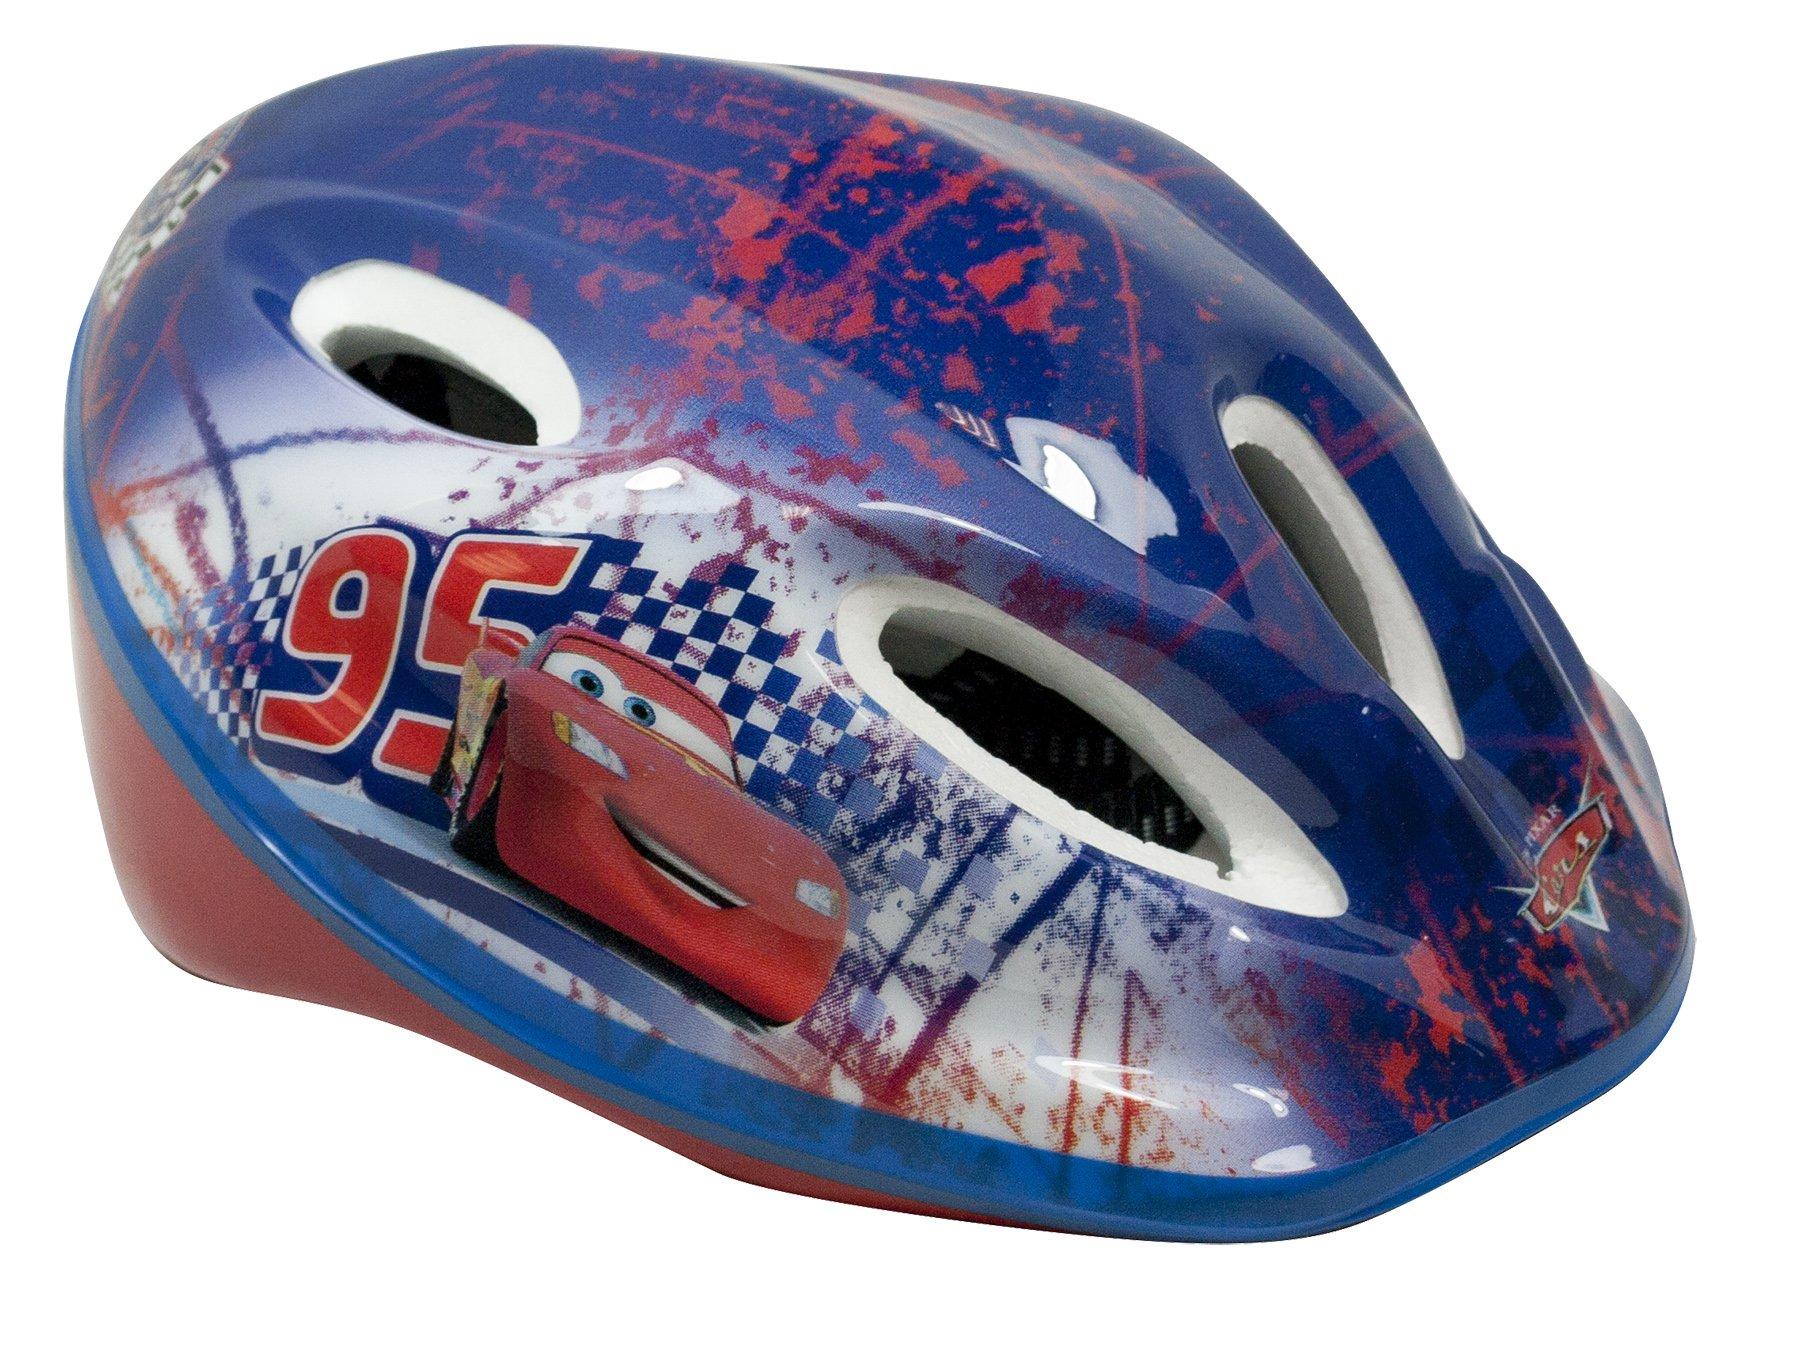 Adjustable Spanner Head circumference Strap Lock Adjustment Strap Stamp Adjustable Size Helmet XS 49-51 cm//–/c893100xs